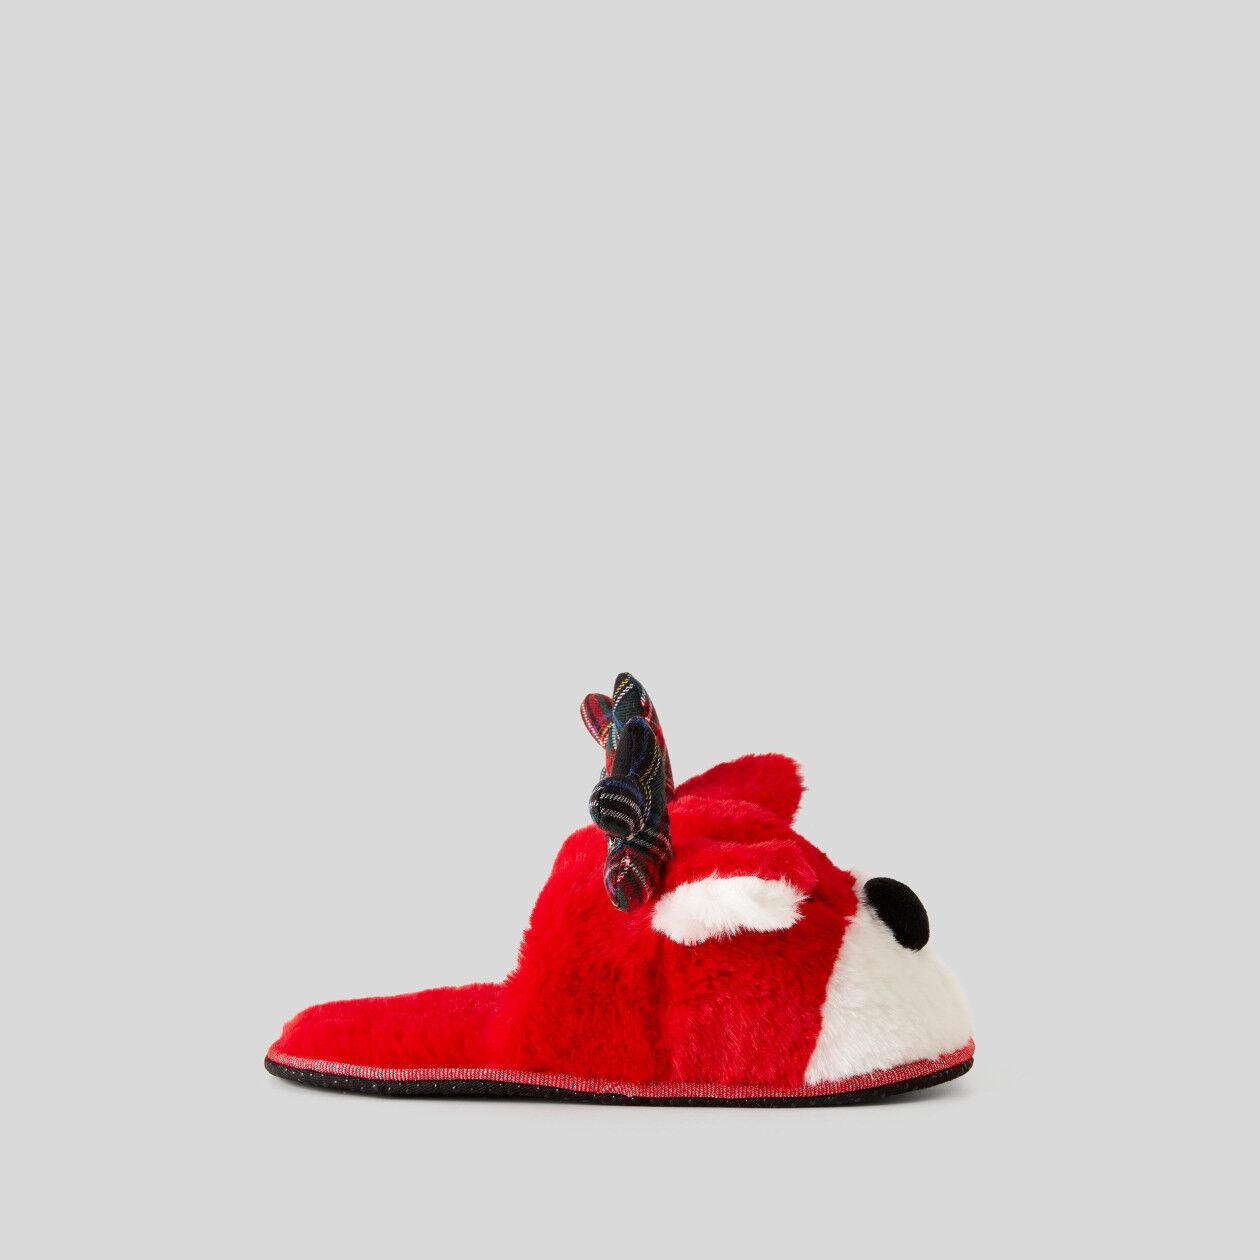 Plush slippers